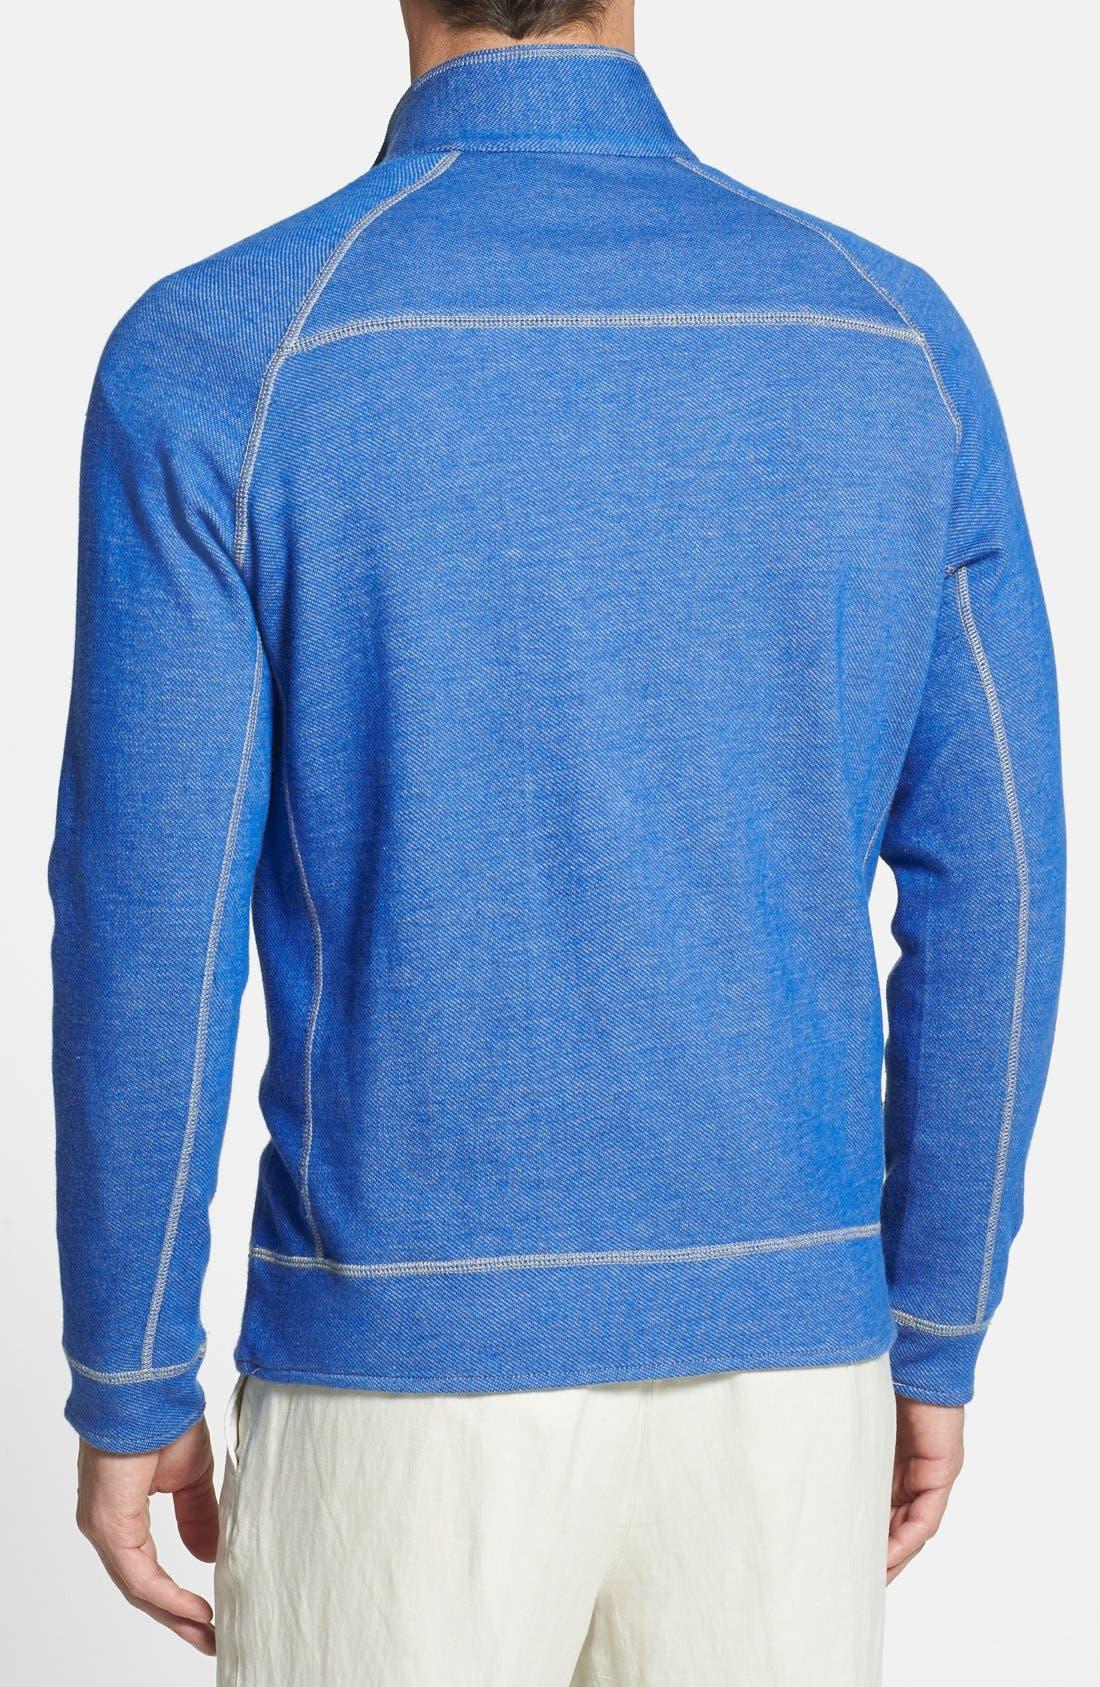 Alternate Image 2  - Tommy Bahama Denim 'Bob Twillin' Island Modern Fit Reversible Half Zip Sweatshirt